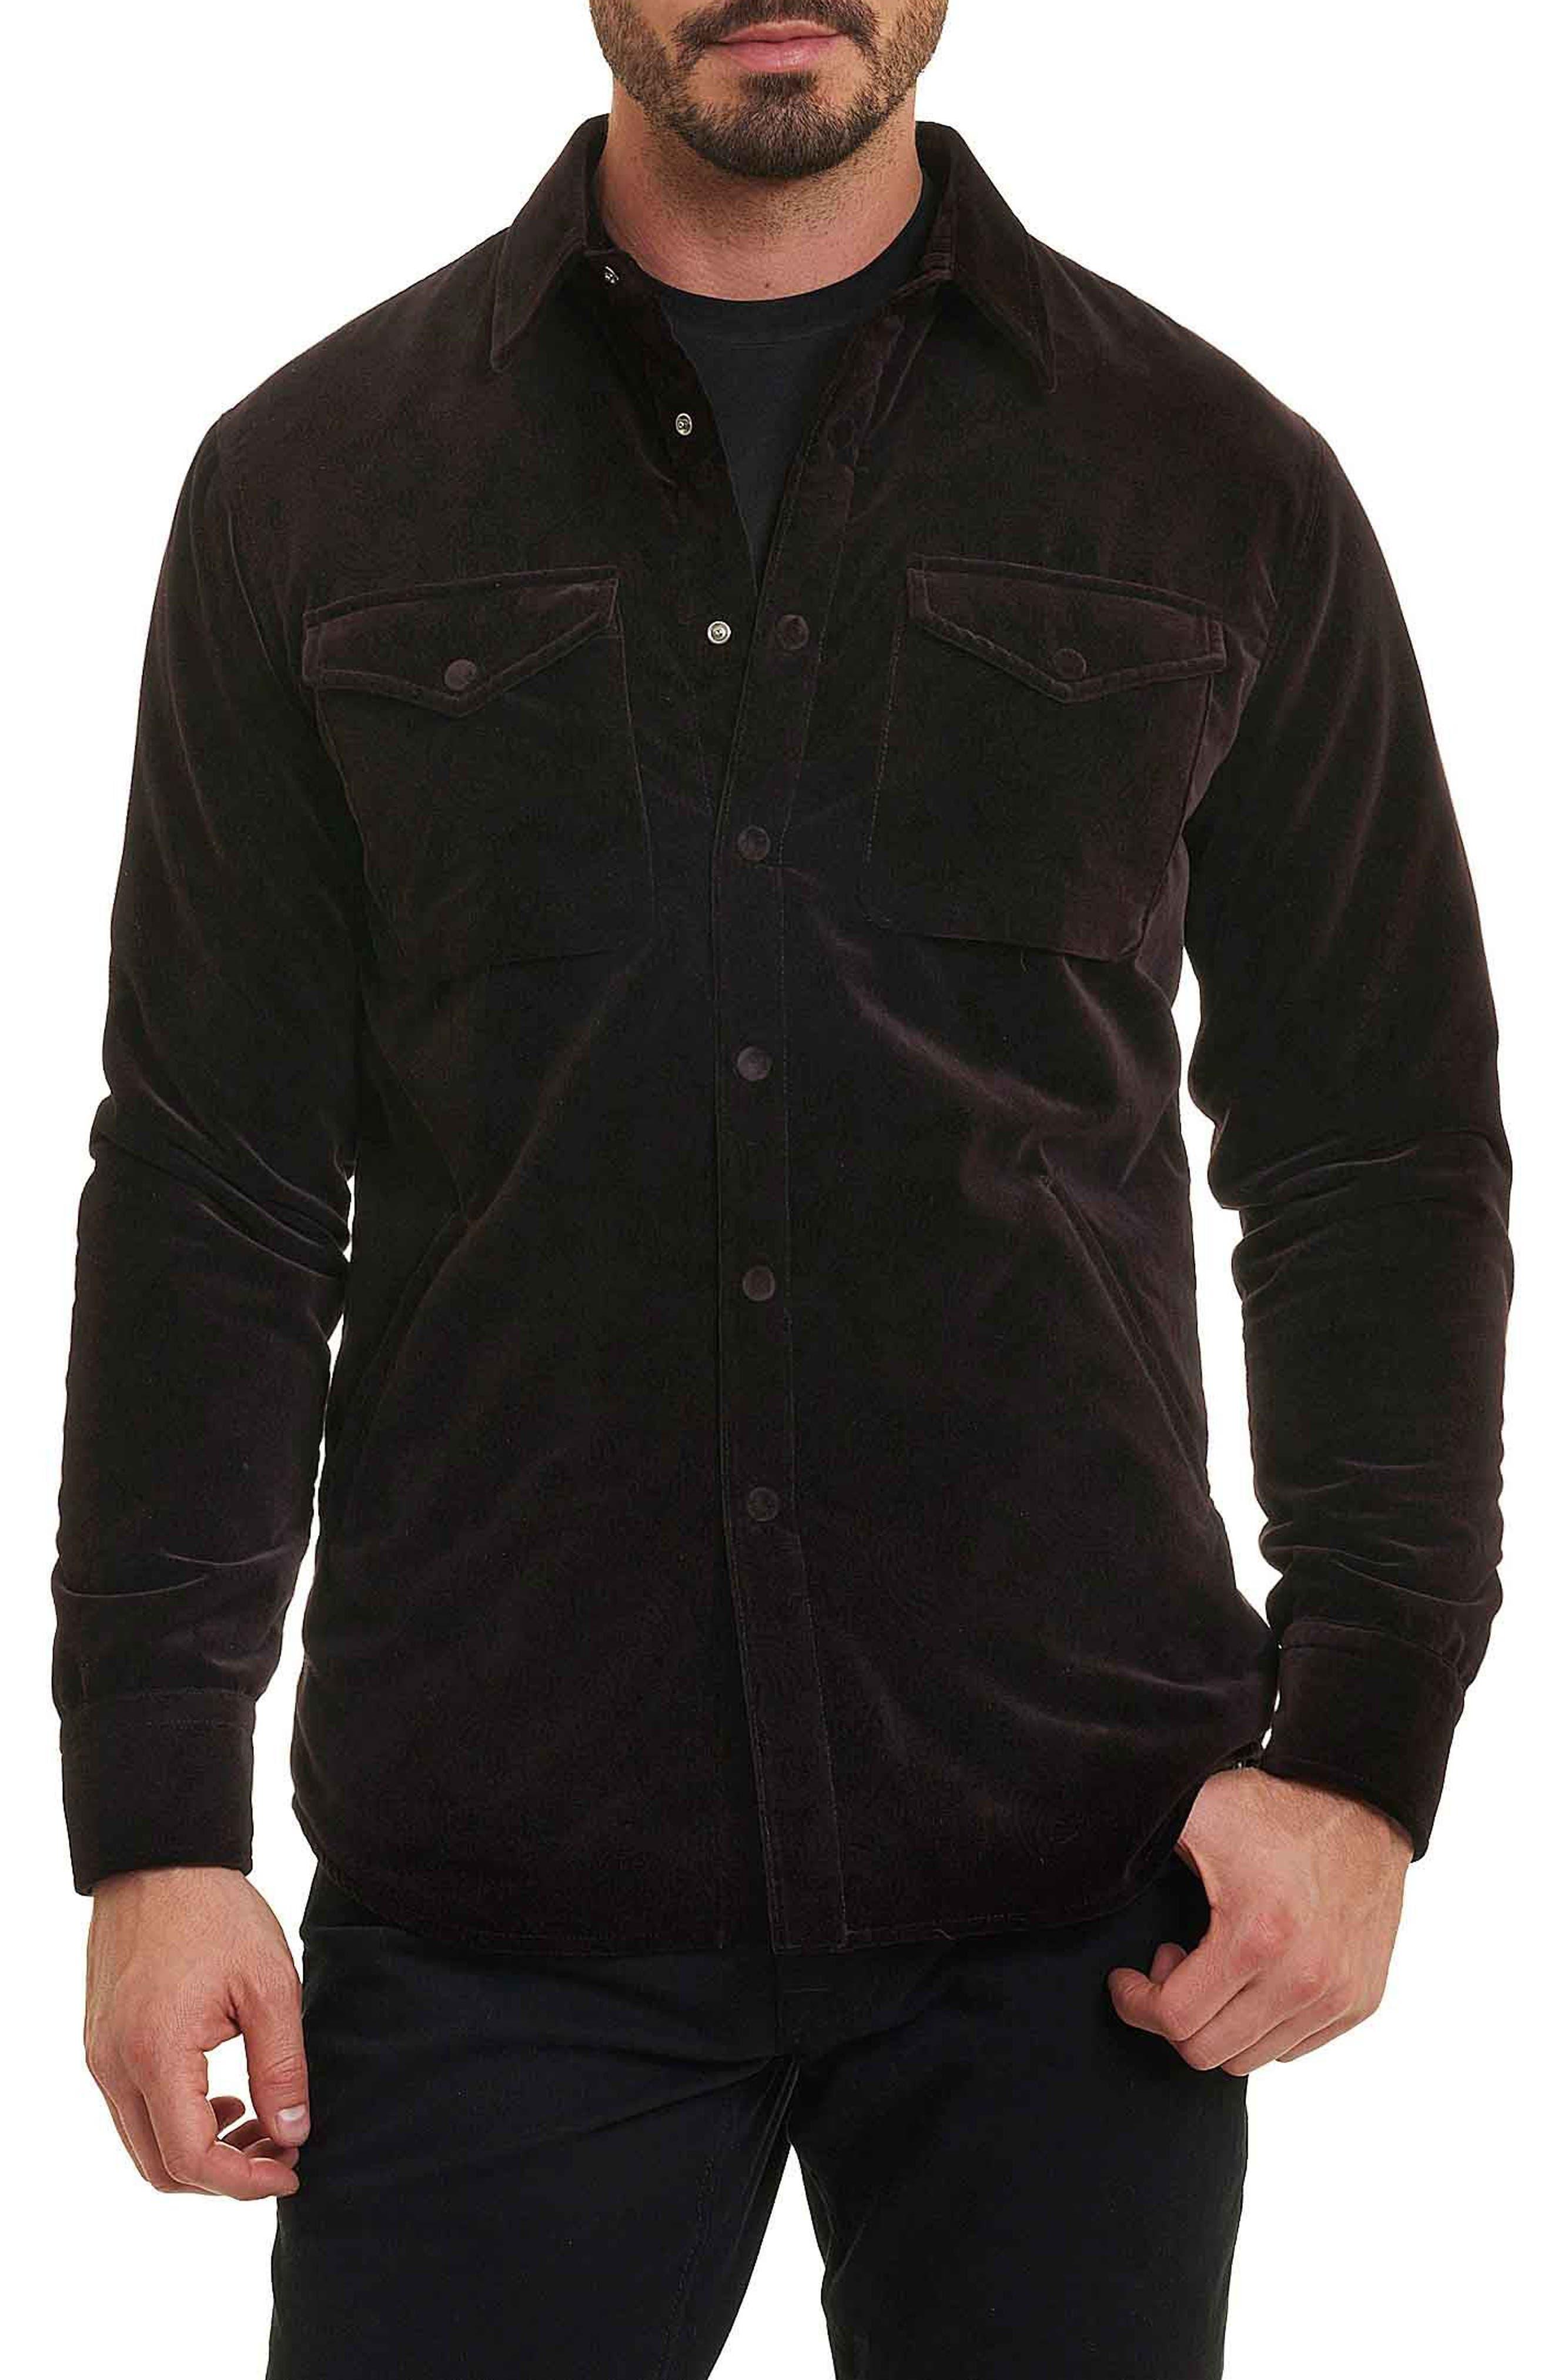 Carnaby Slim Fit Shirt Jacket,                             Main thumbnail 1, color,                             EGGPLANT